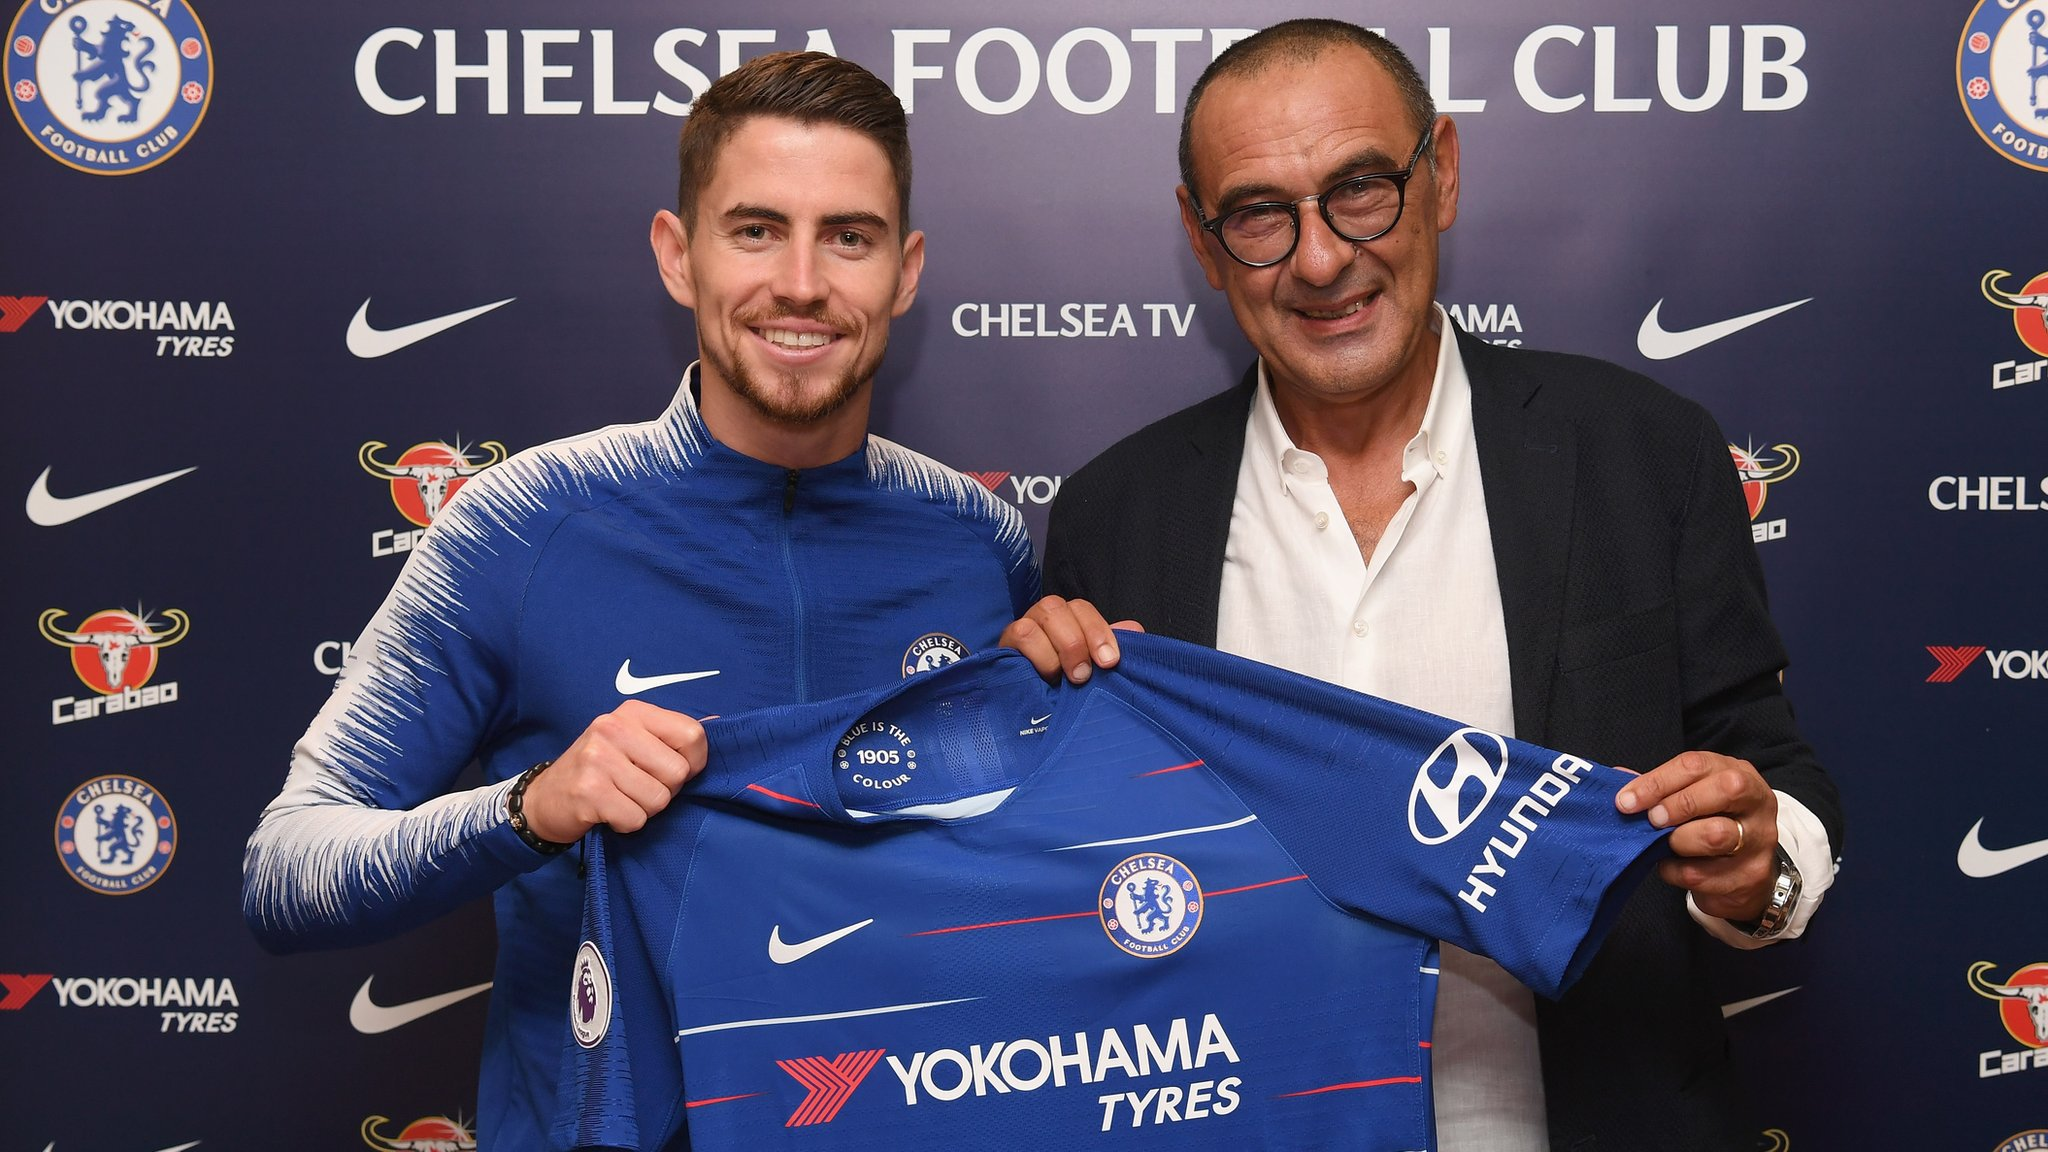 Premier League transfers: Club-by-club guide to deals so far